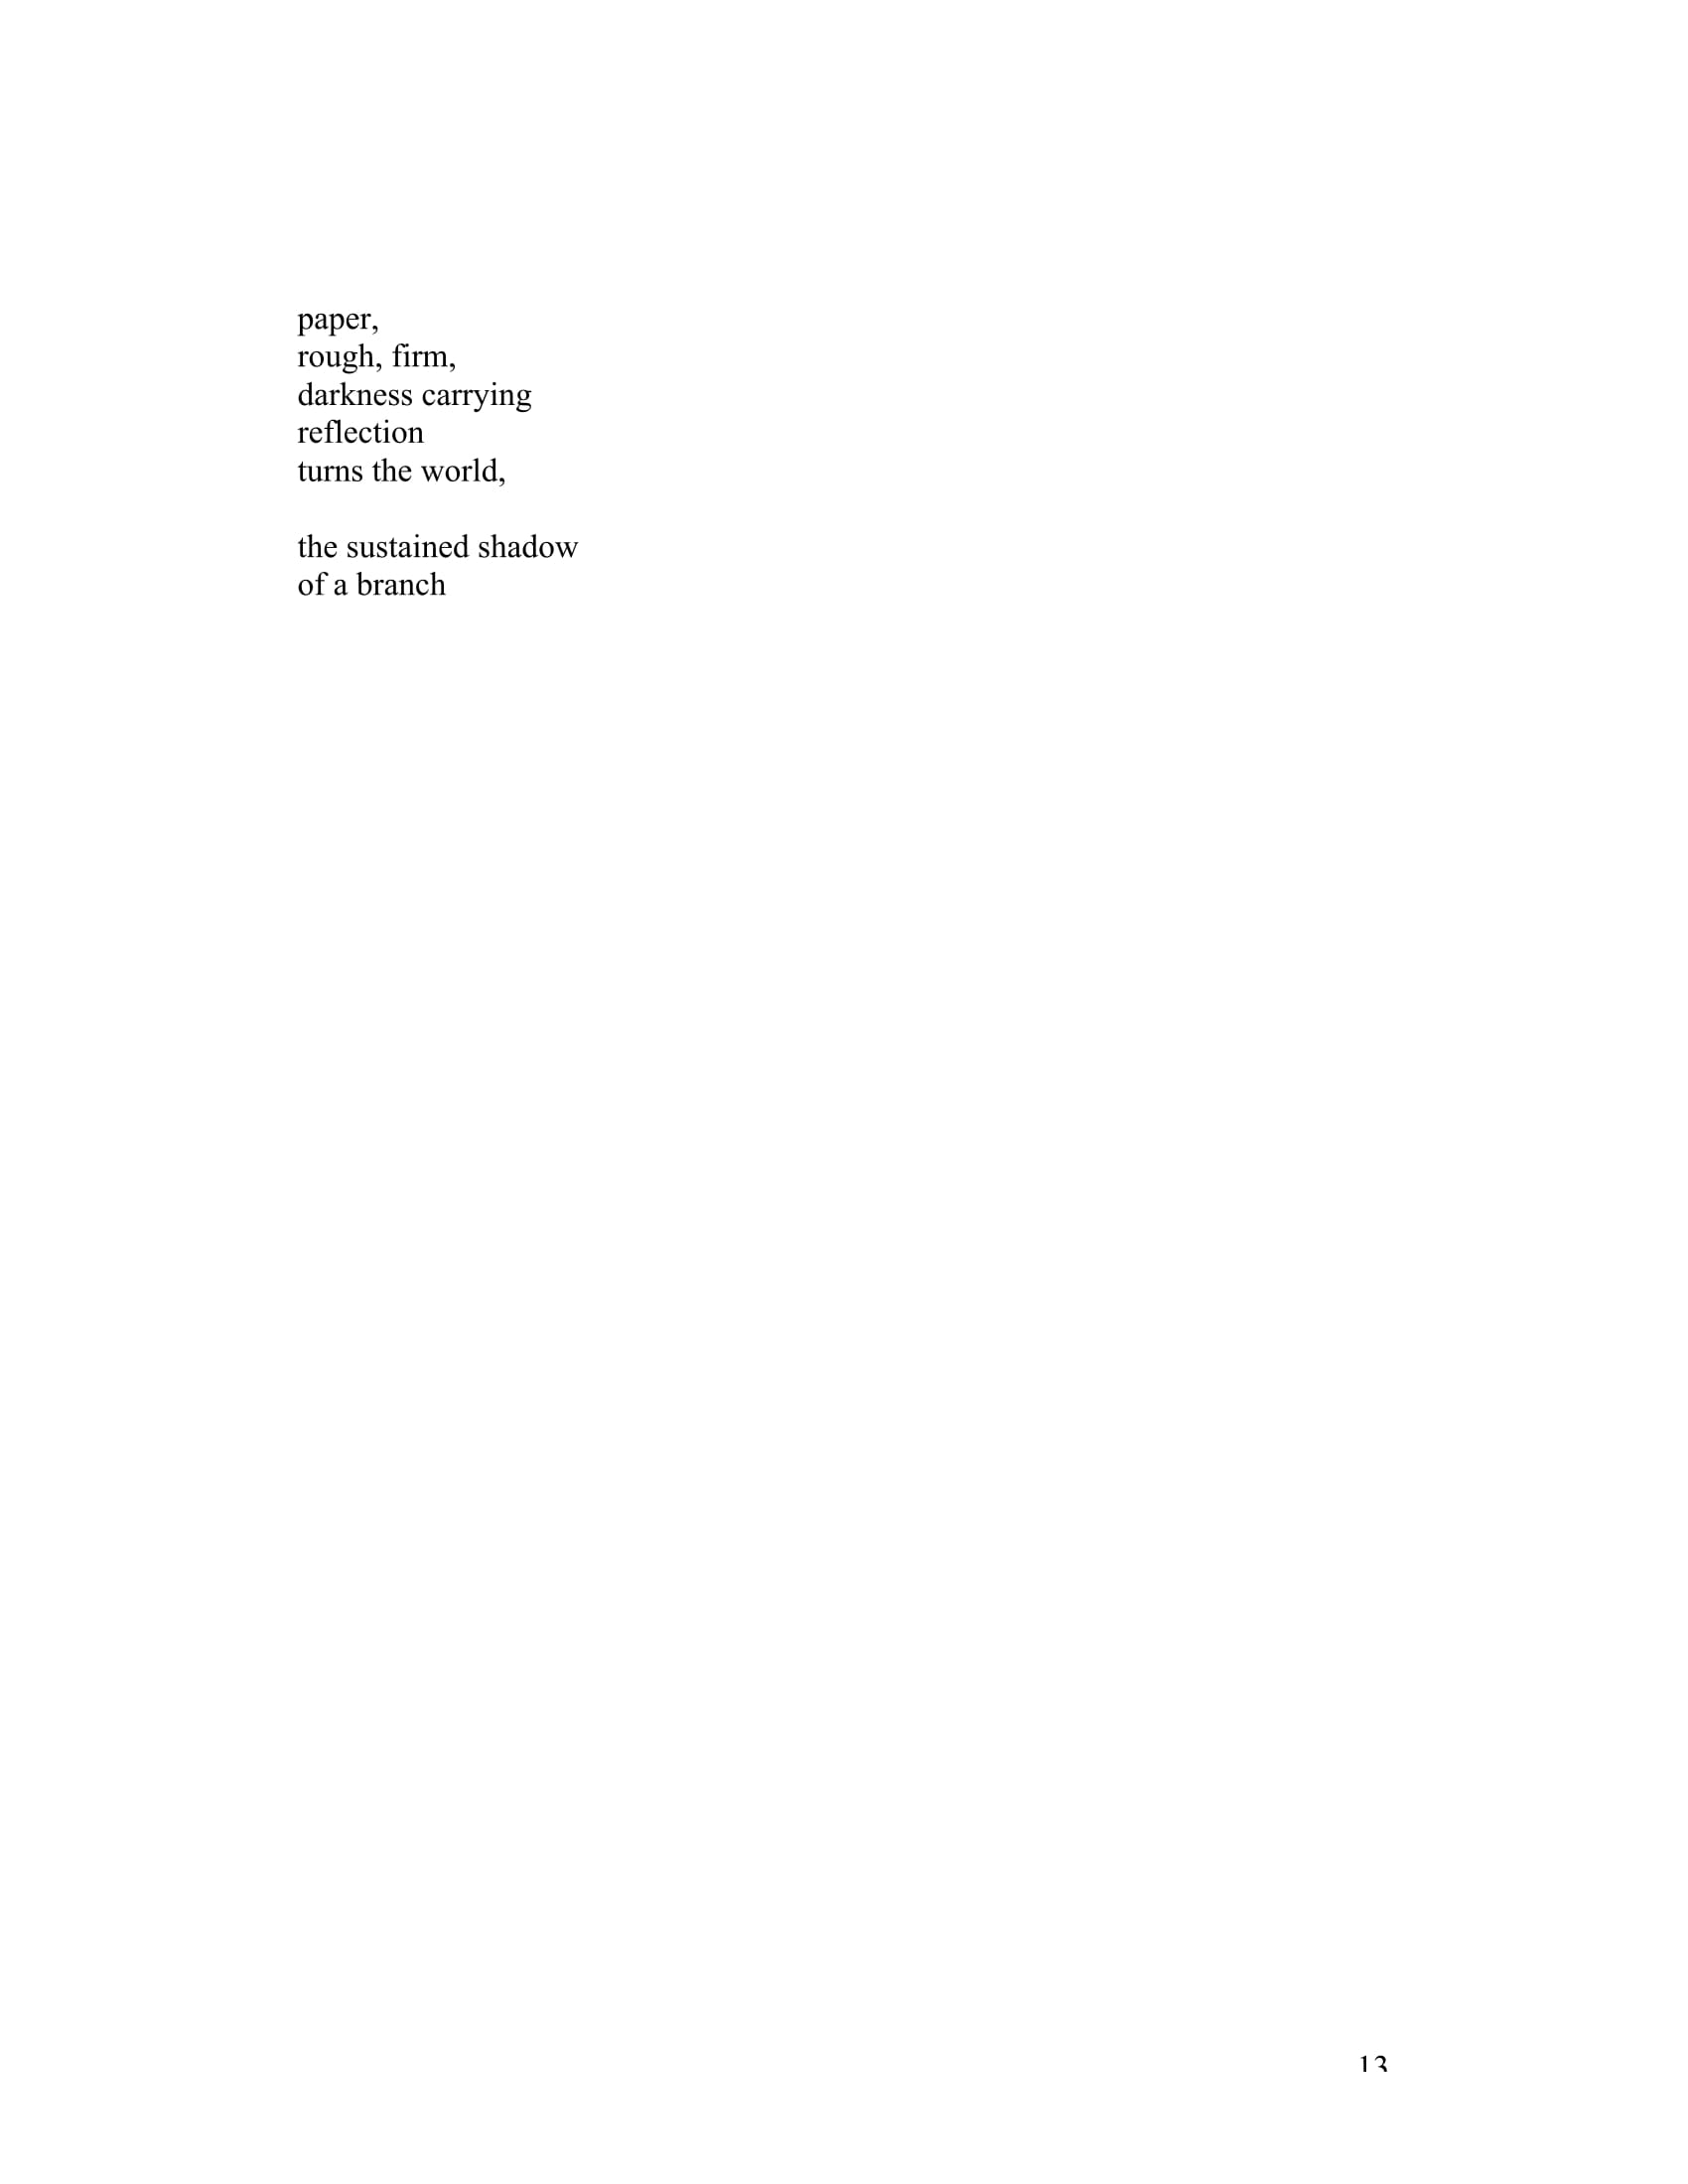 2017.10.31 UNWINDING PAGE-13.jpg